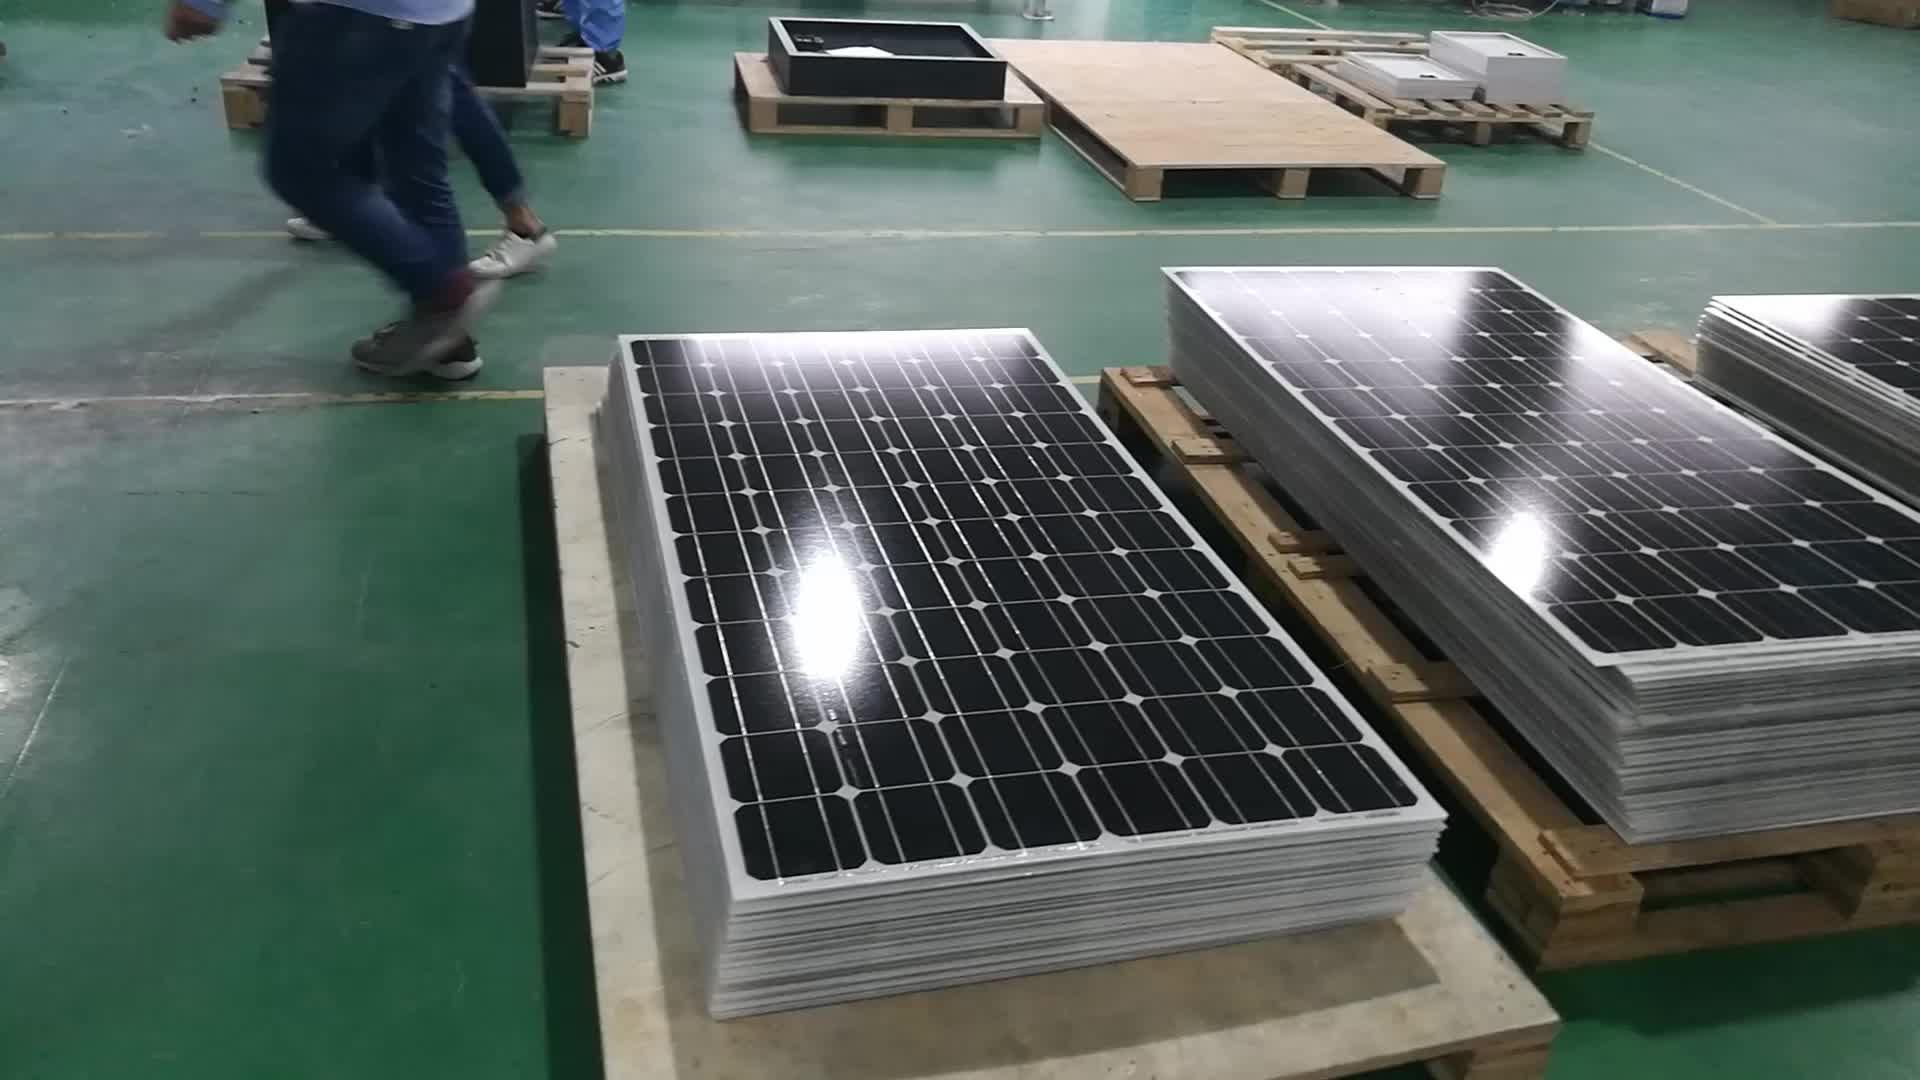 12000BTU 100% DC 48 V solar air conditioner unit muur split type voor thuis/klaar om 100% solar airconditioner